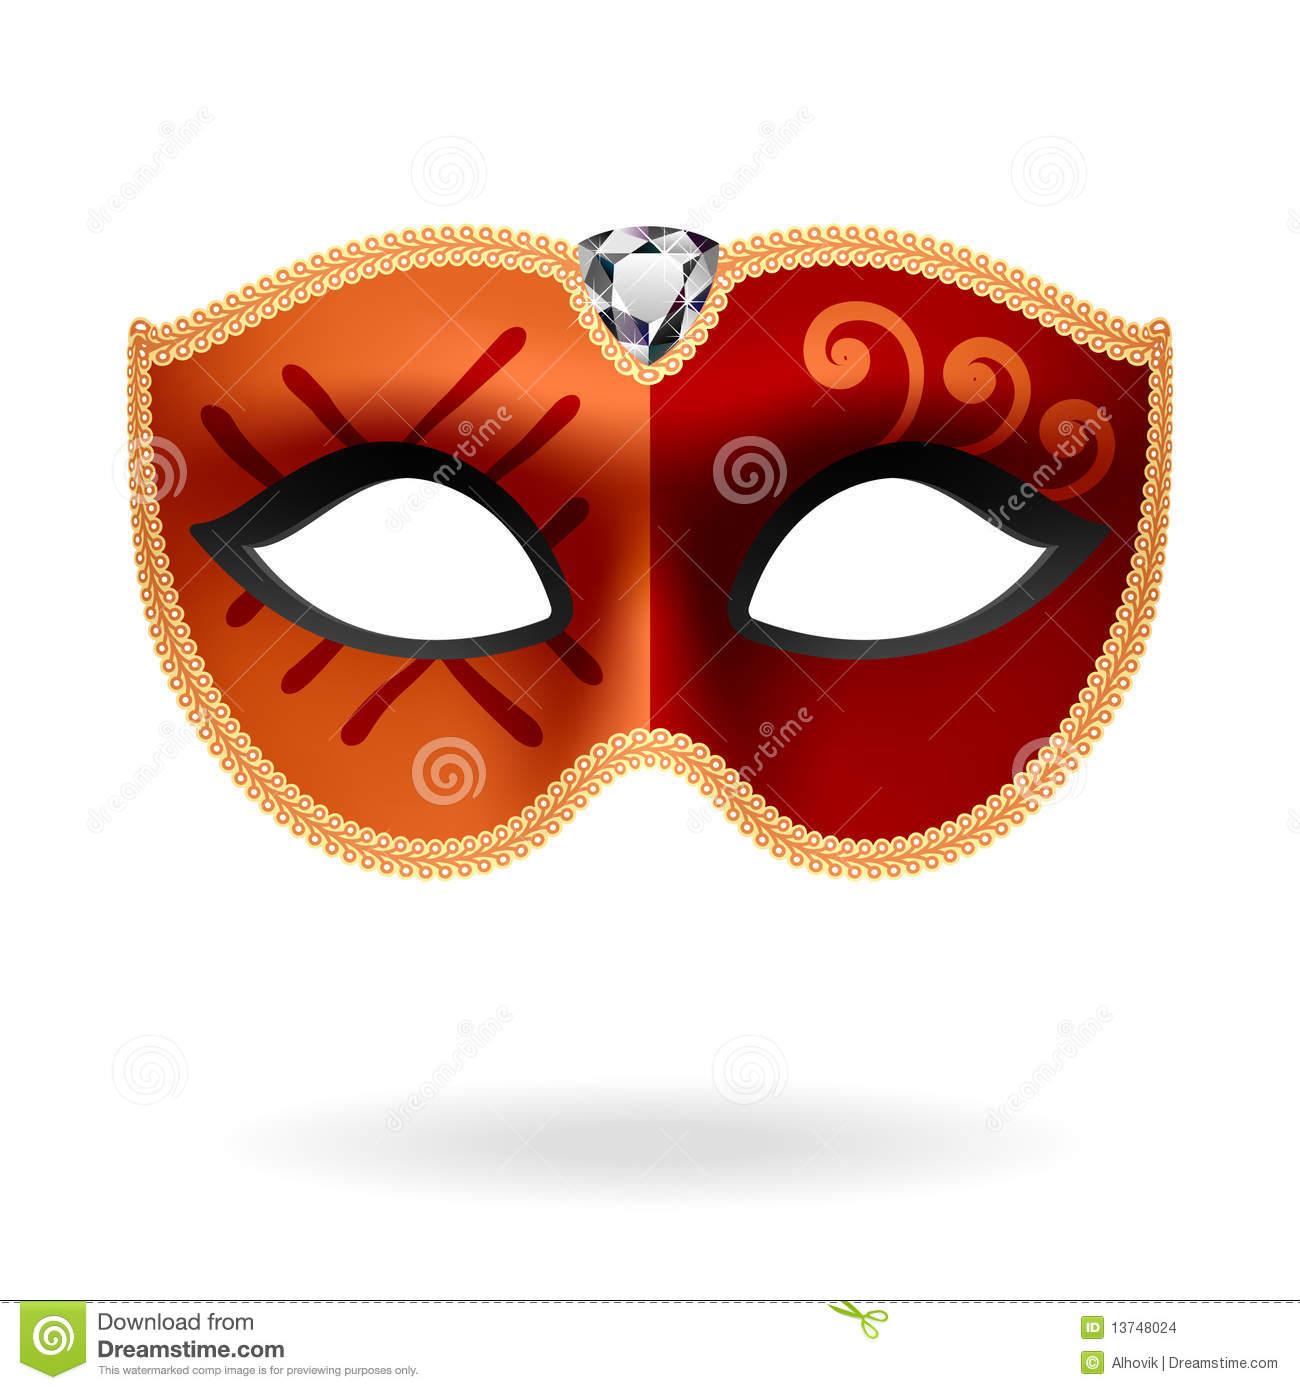 Masquerade Mask Stock Images-Masquerade Mask Stock Images-10